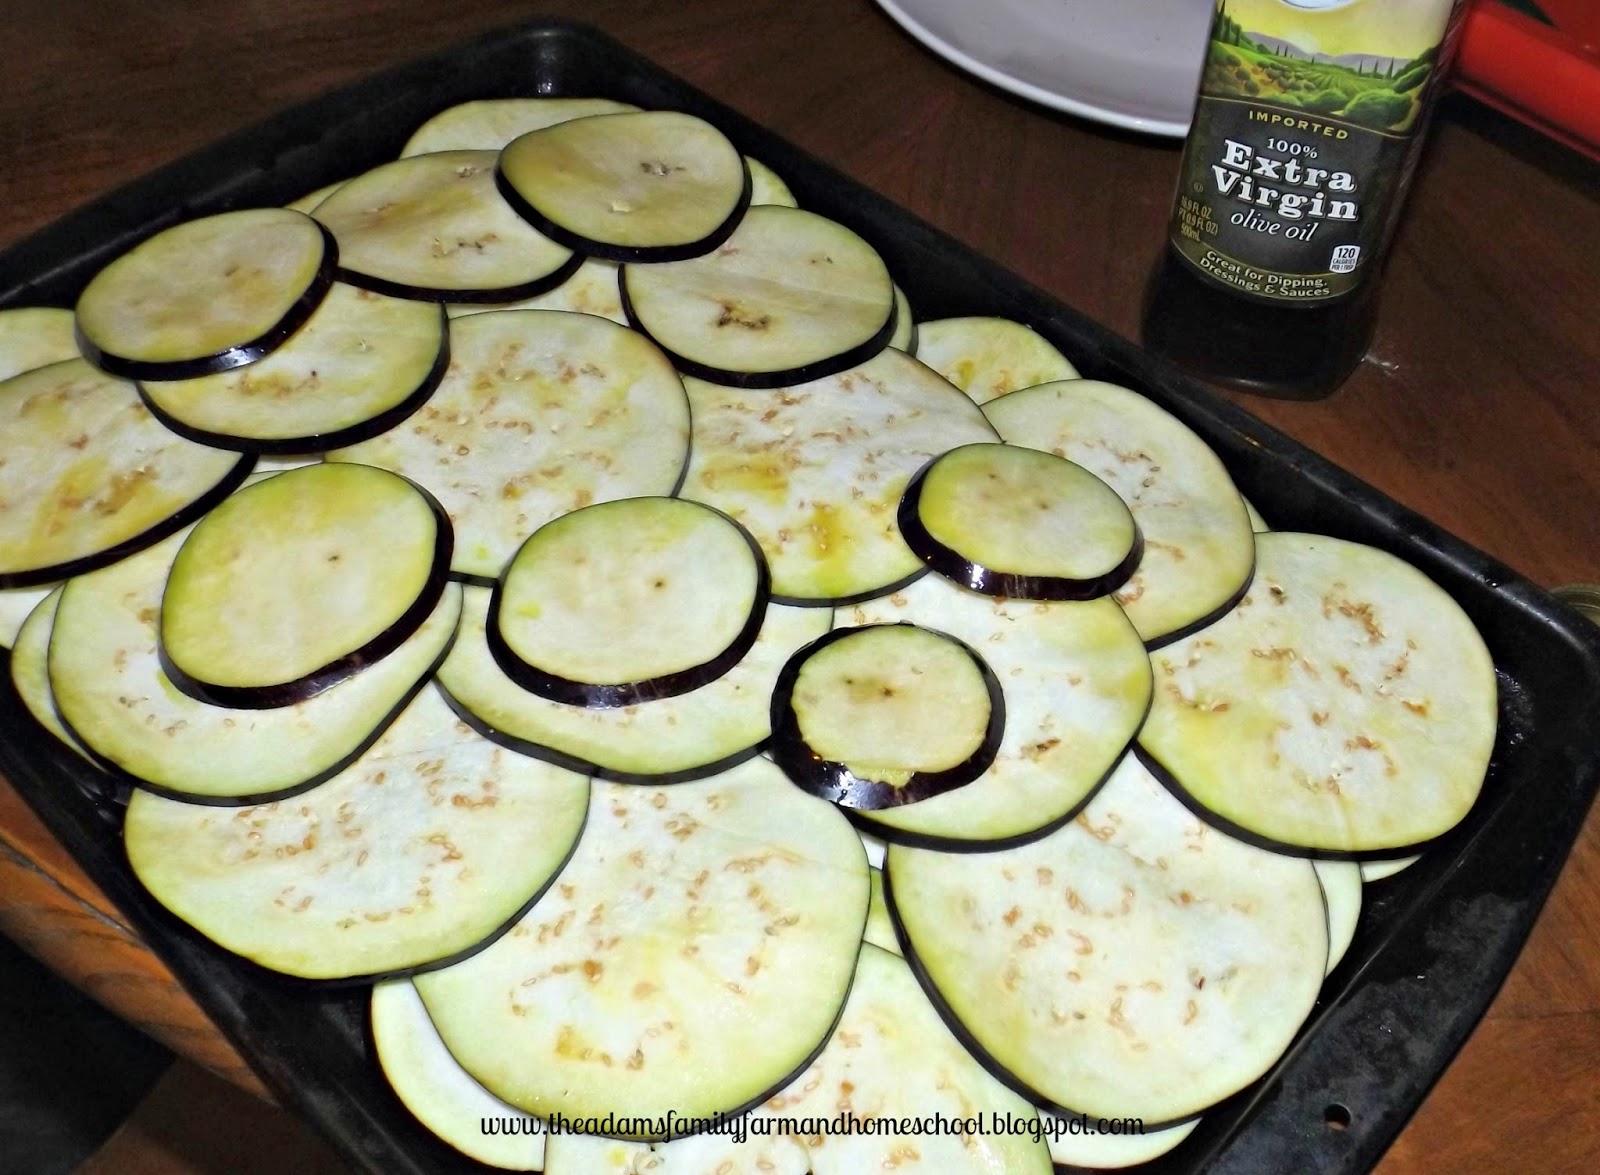 Eggplant Slices Ready to Roast